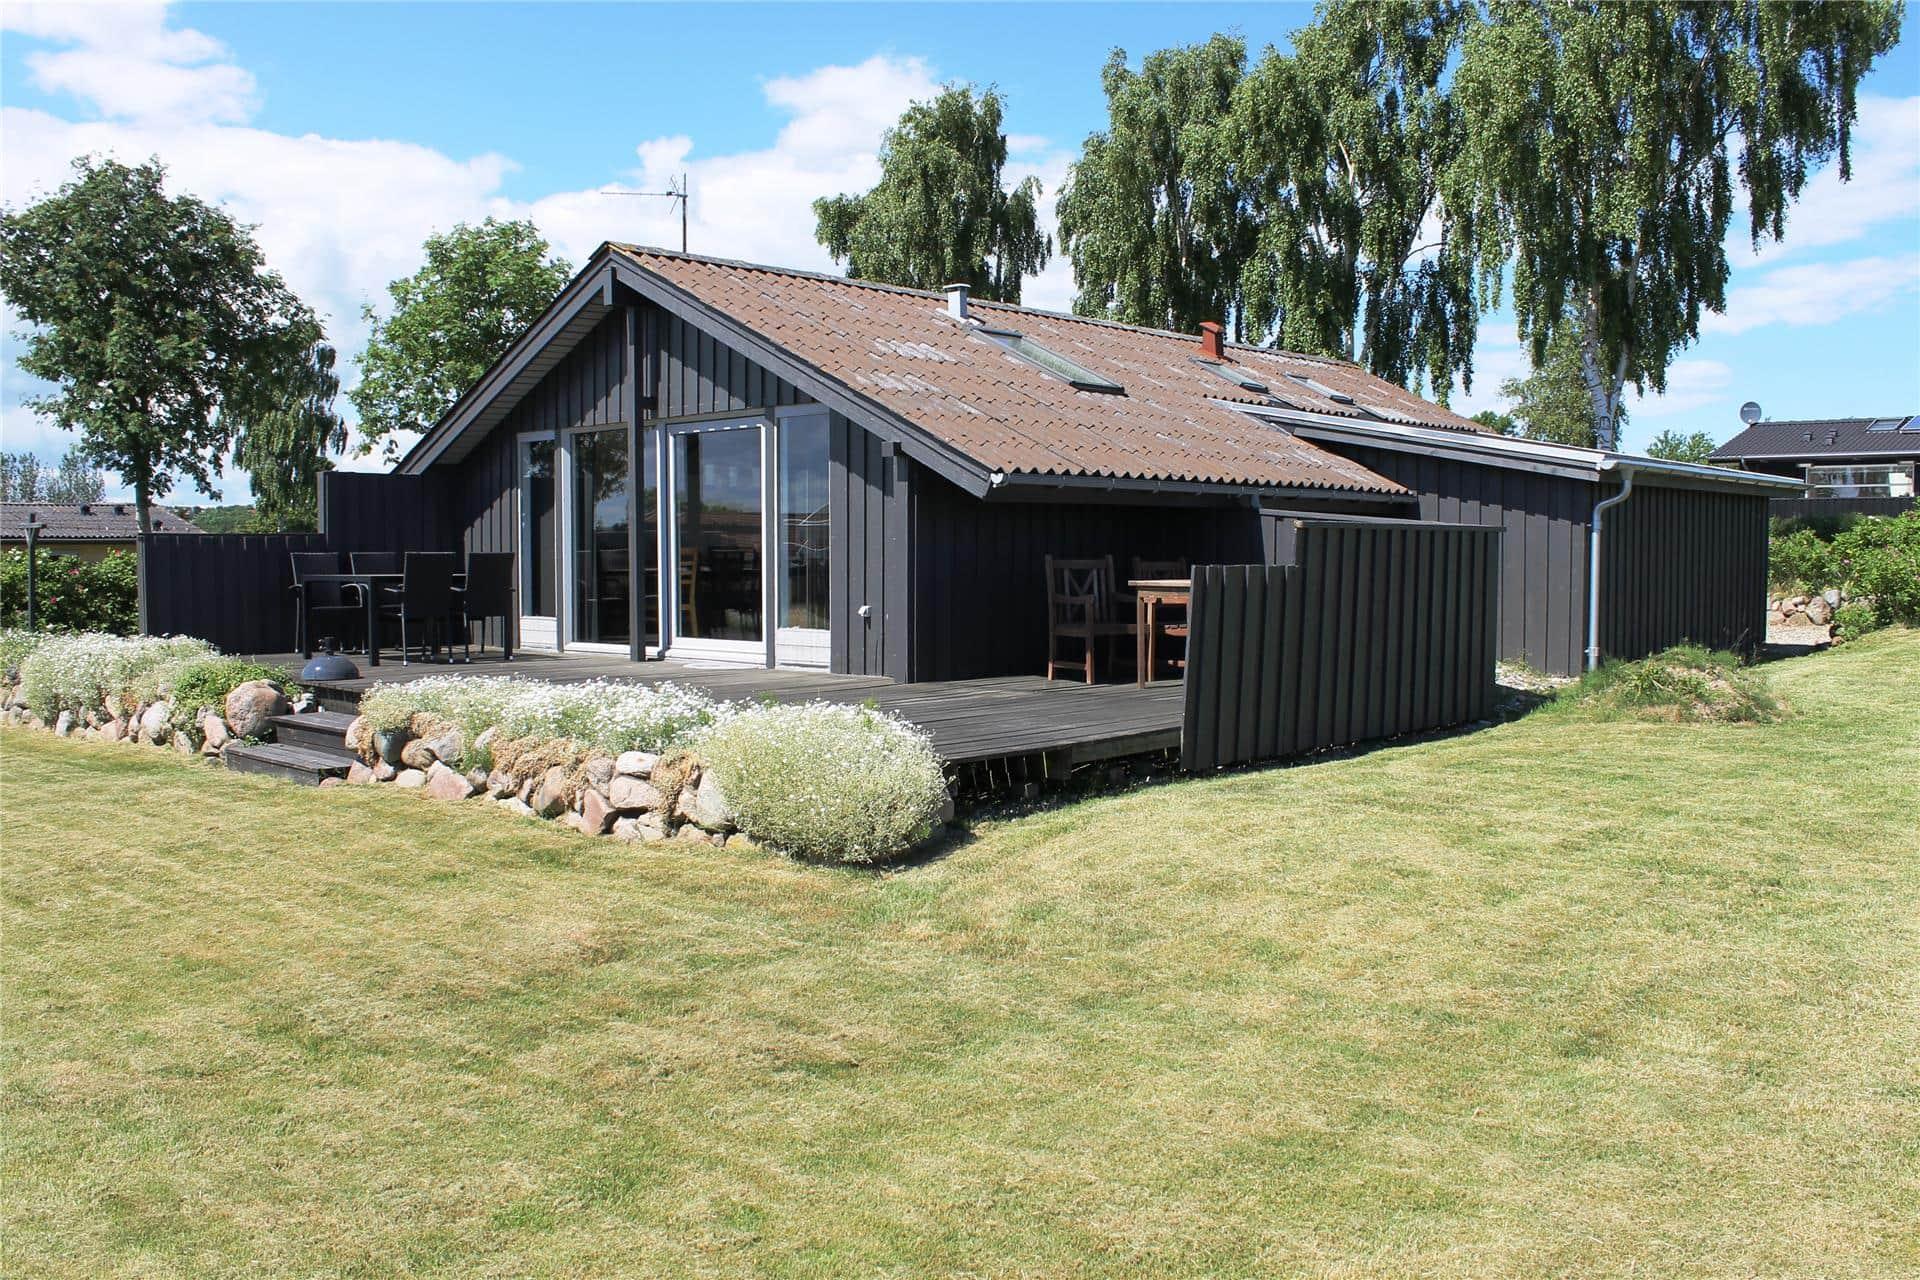 Bilde 1-23 Feirehus 8441, Præstekravevej 42, DK - 8410 Rønde